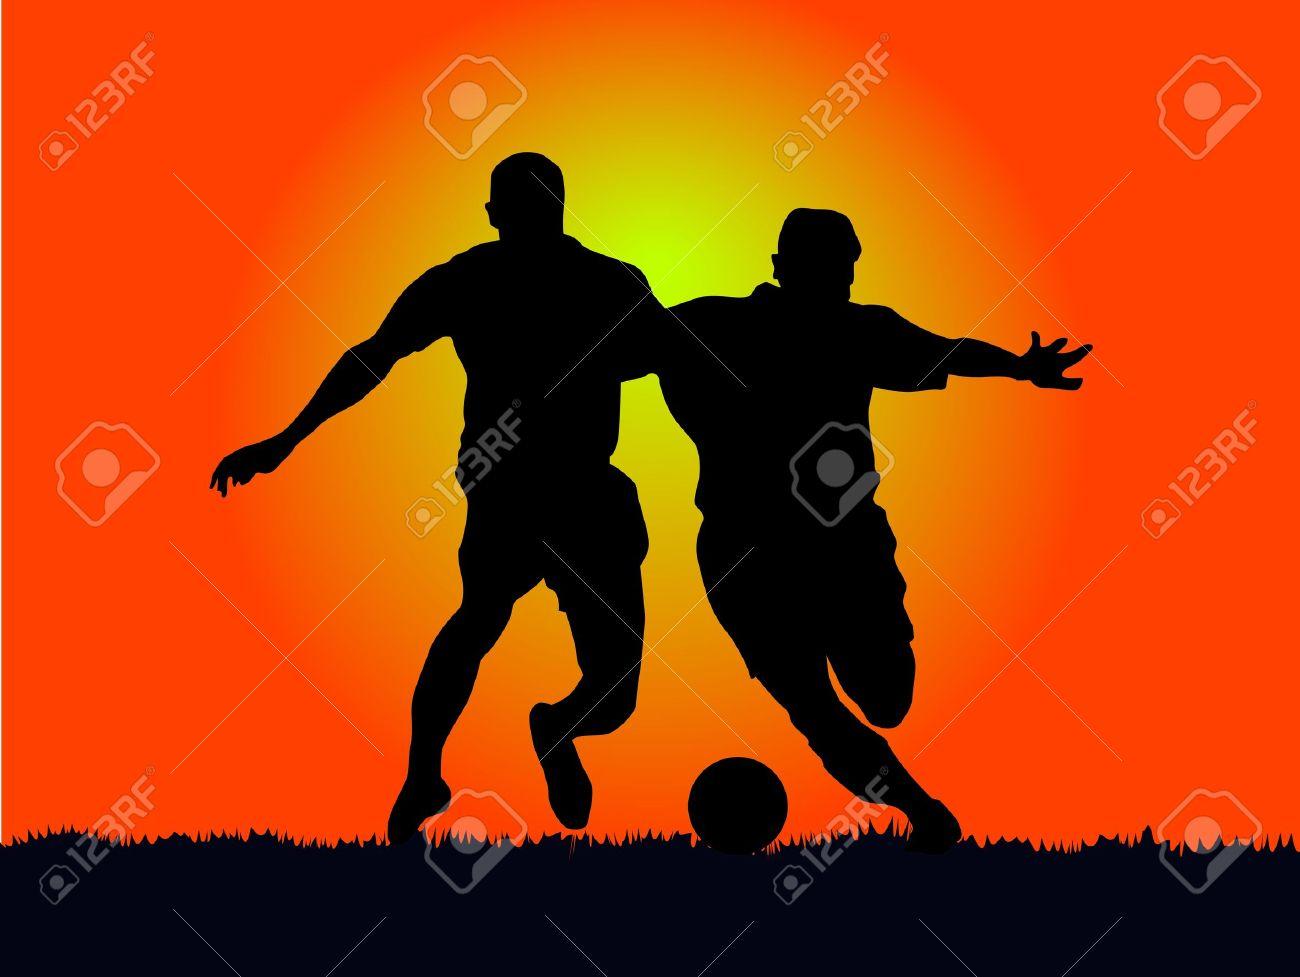 Football Athlete, In The Sun Resist Of Vehemence. Royalty Free.